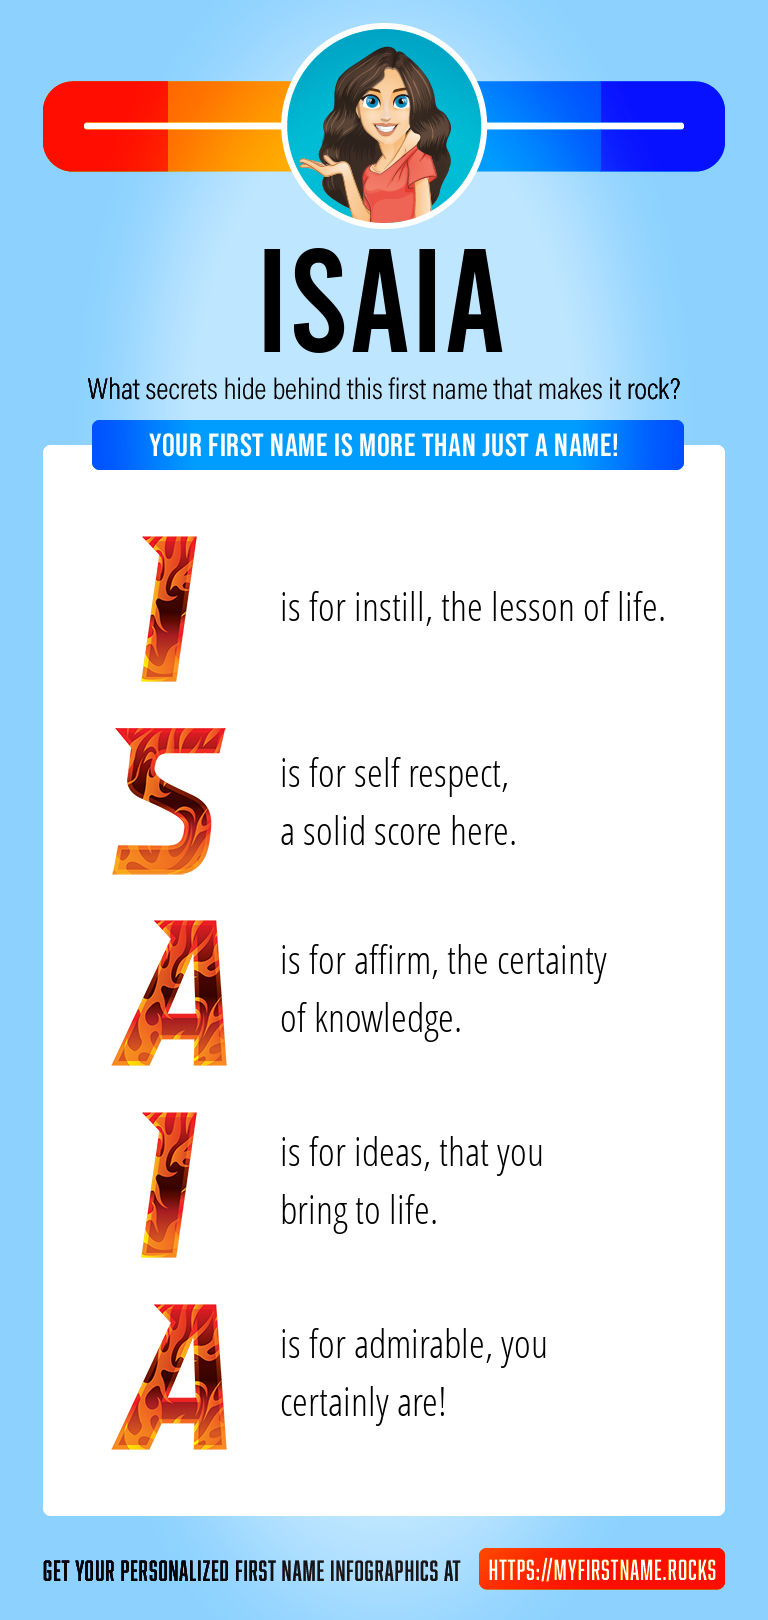 Isaia Infographics